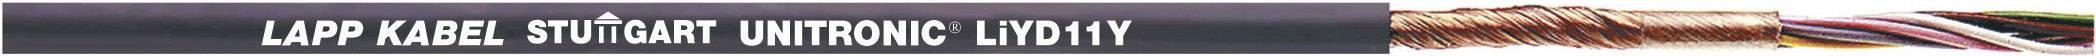 Datový kabel UNITRONIC LIYD11Y 12x0,14